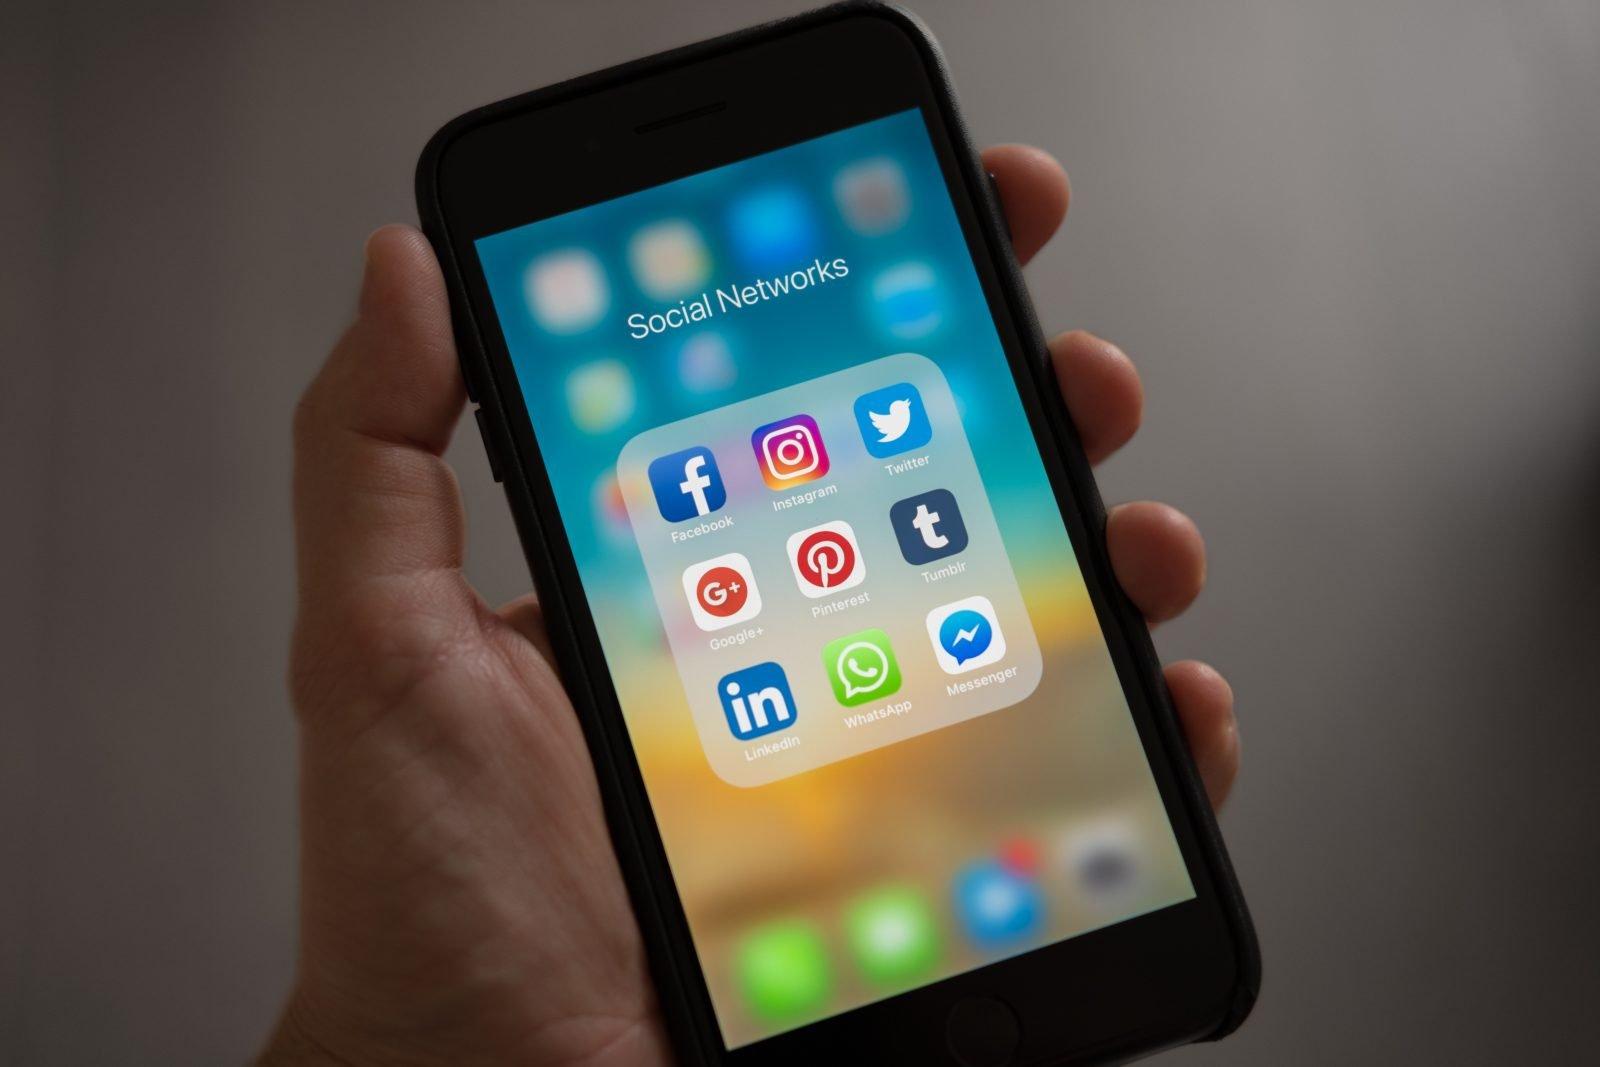 apple-applications-apps-607812-1-1600x1067.jpg